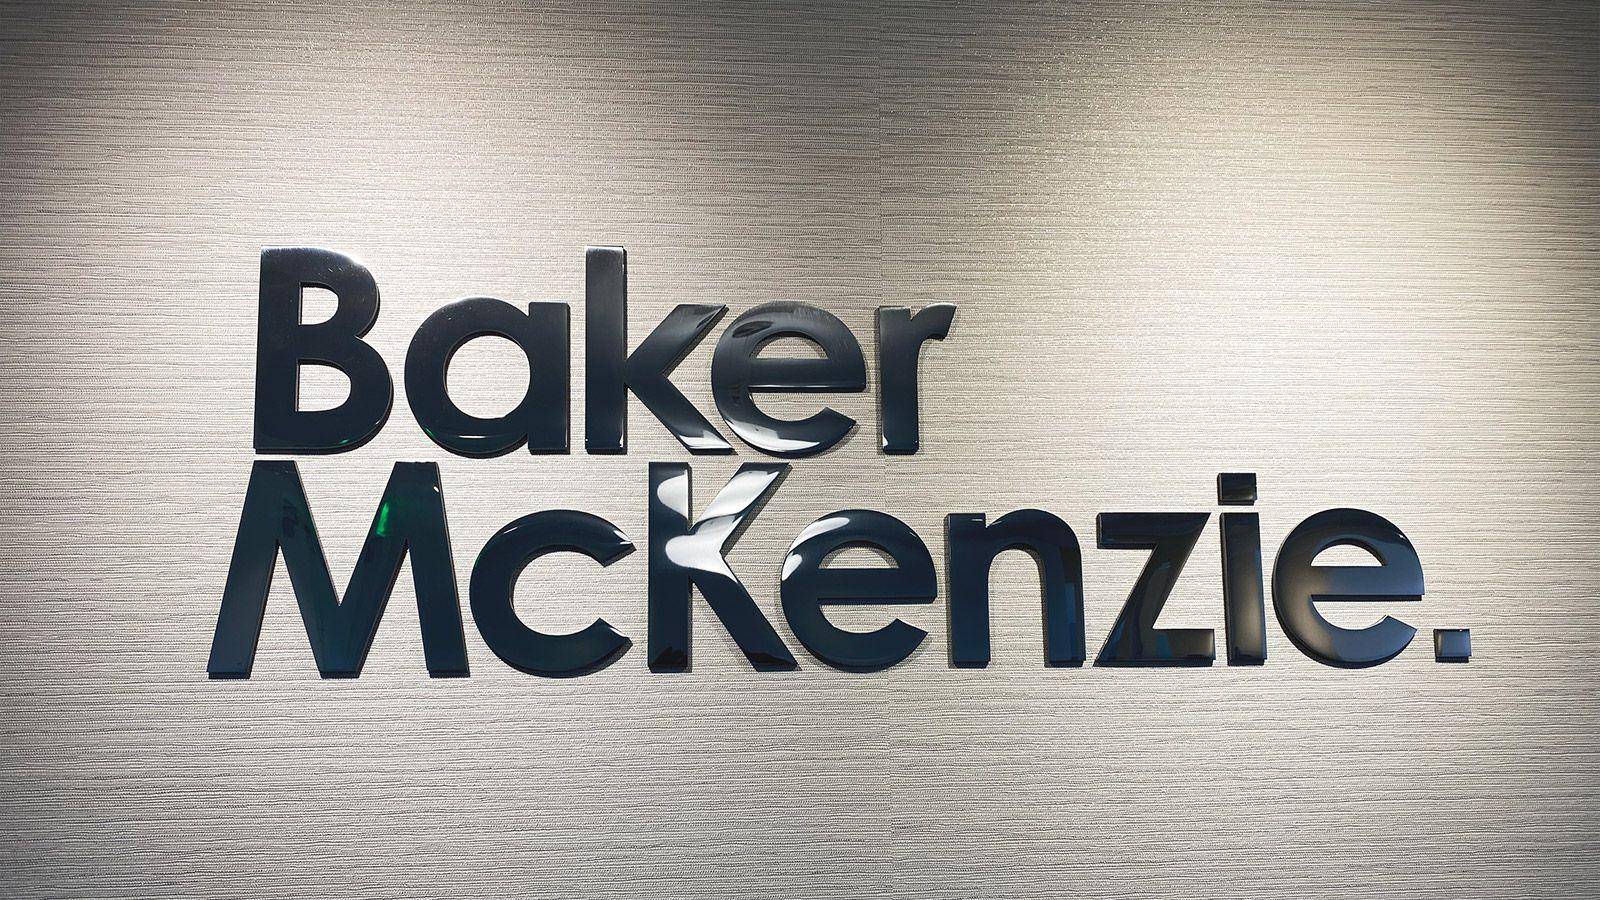 Baker McKenzie acrylic 3D letters